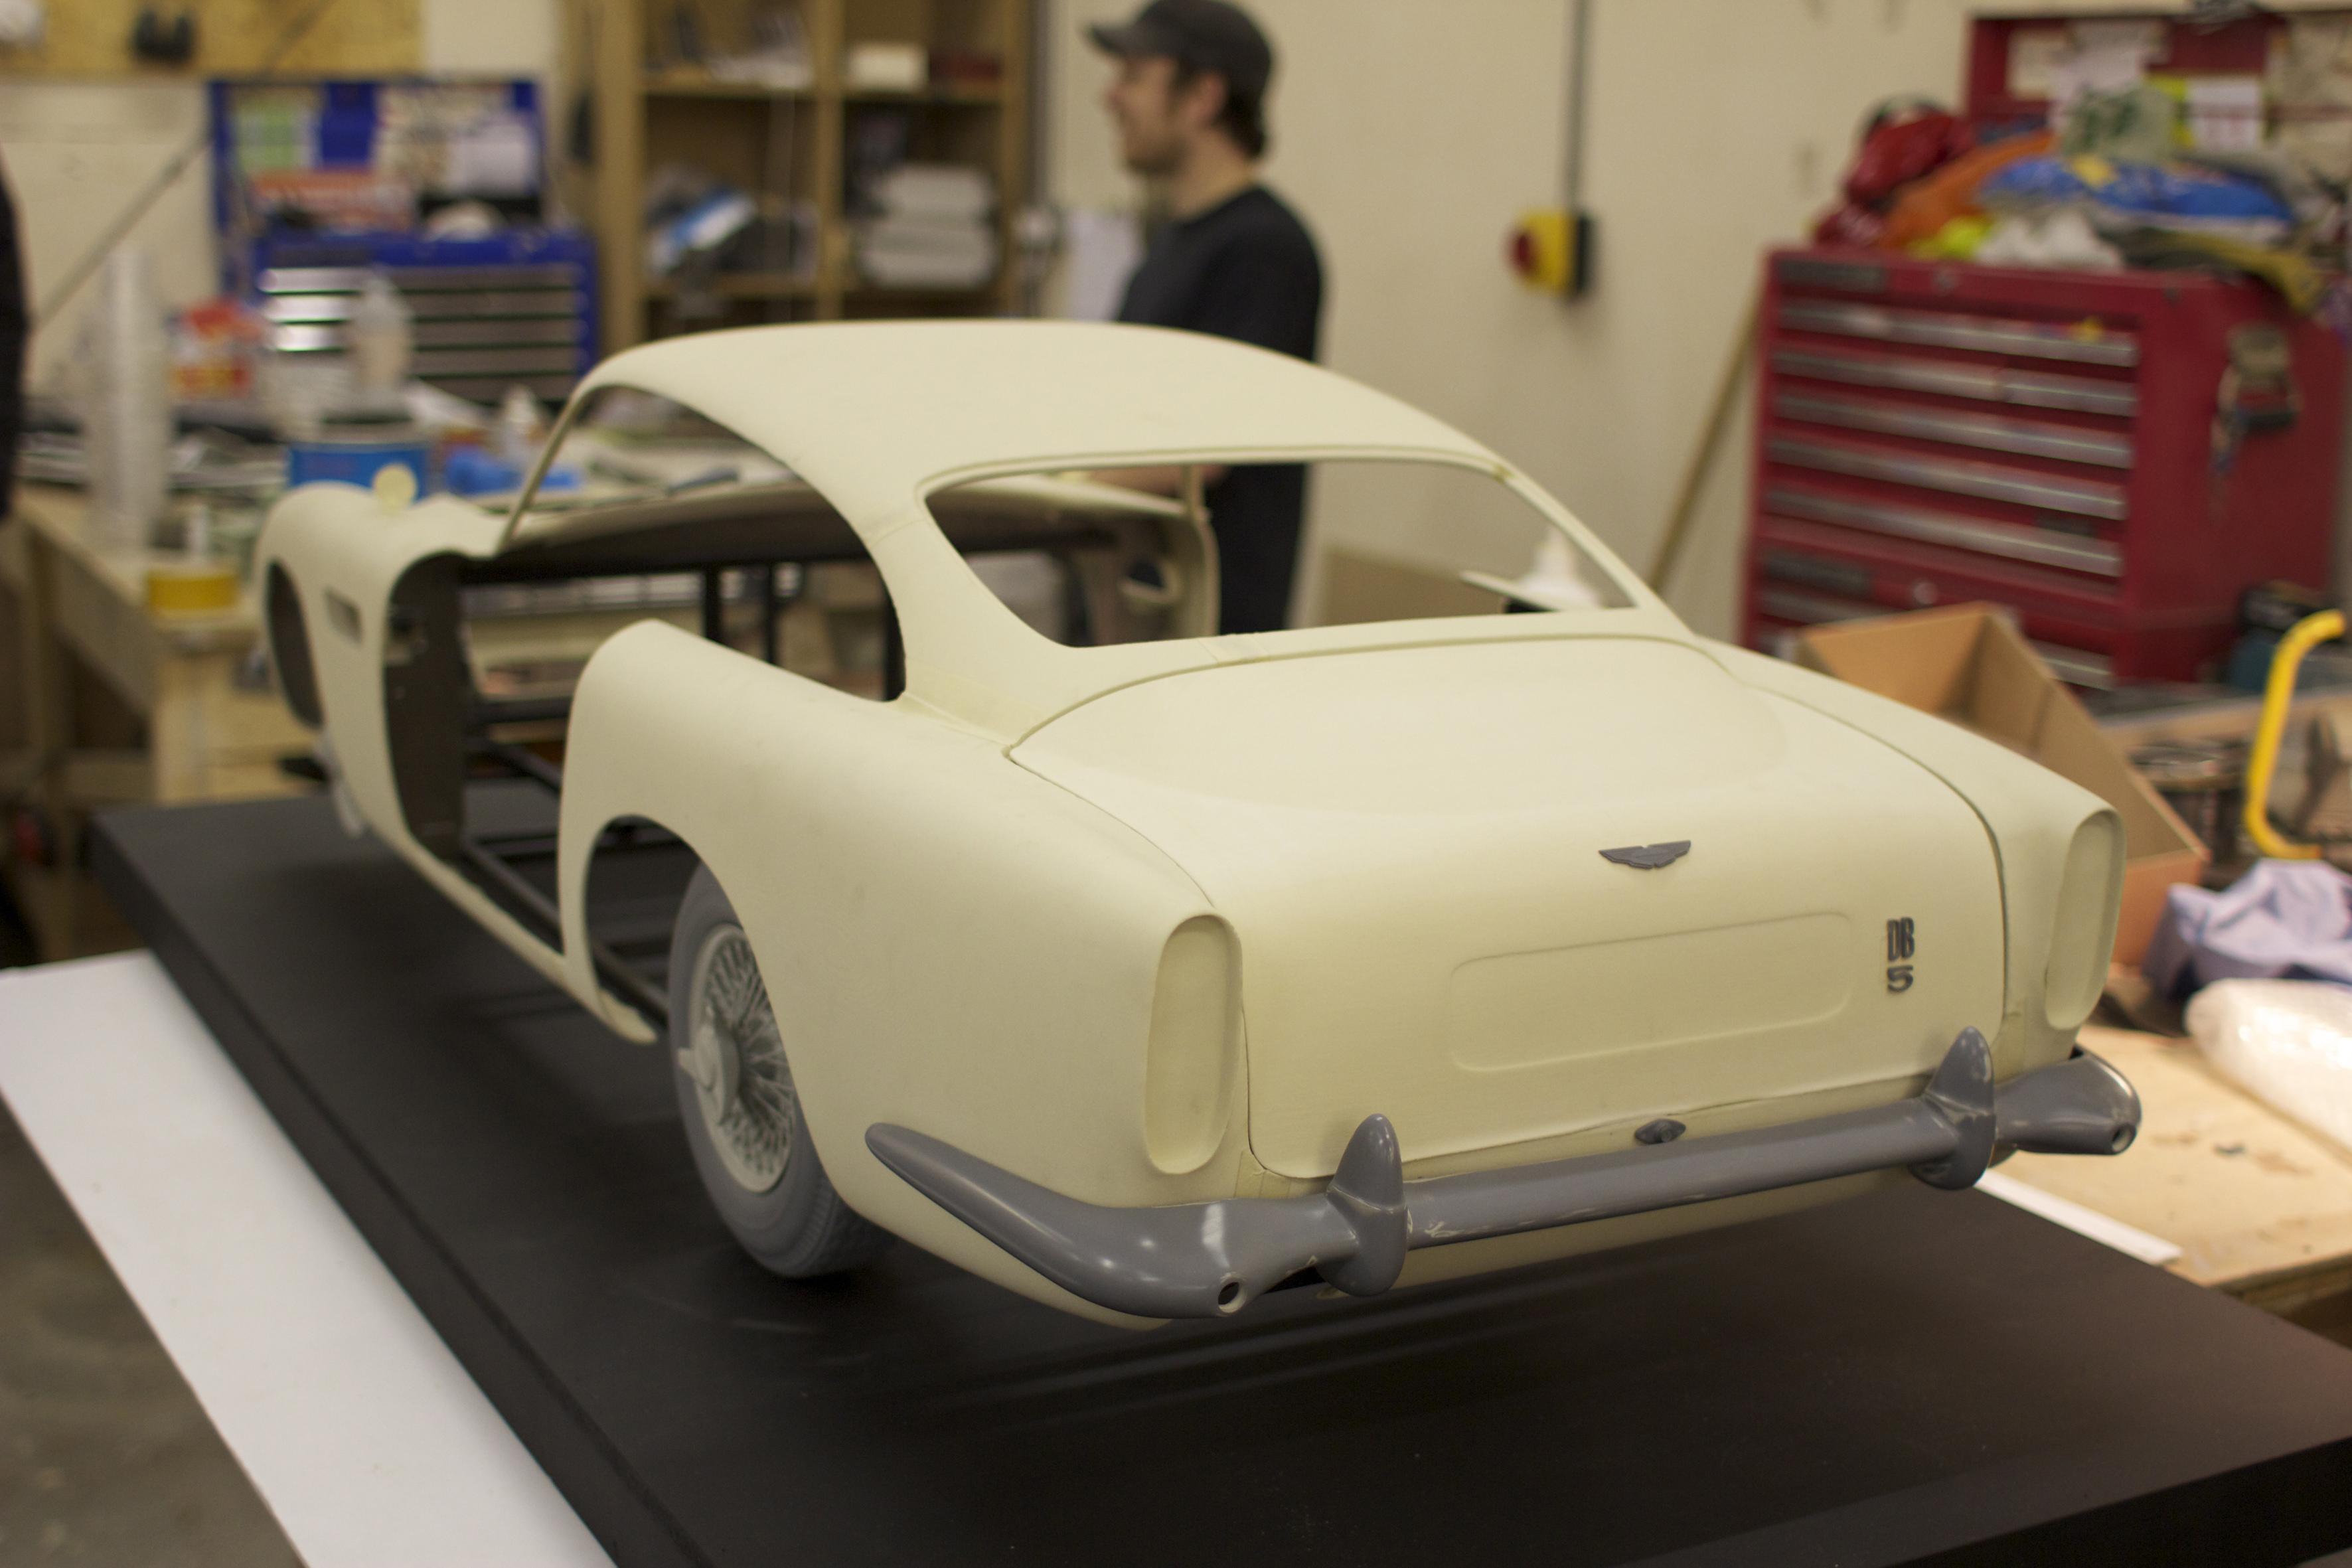 Voxeljet изготовила Aston Martin для Джеймса Бонда на 3D-принтере